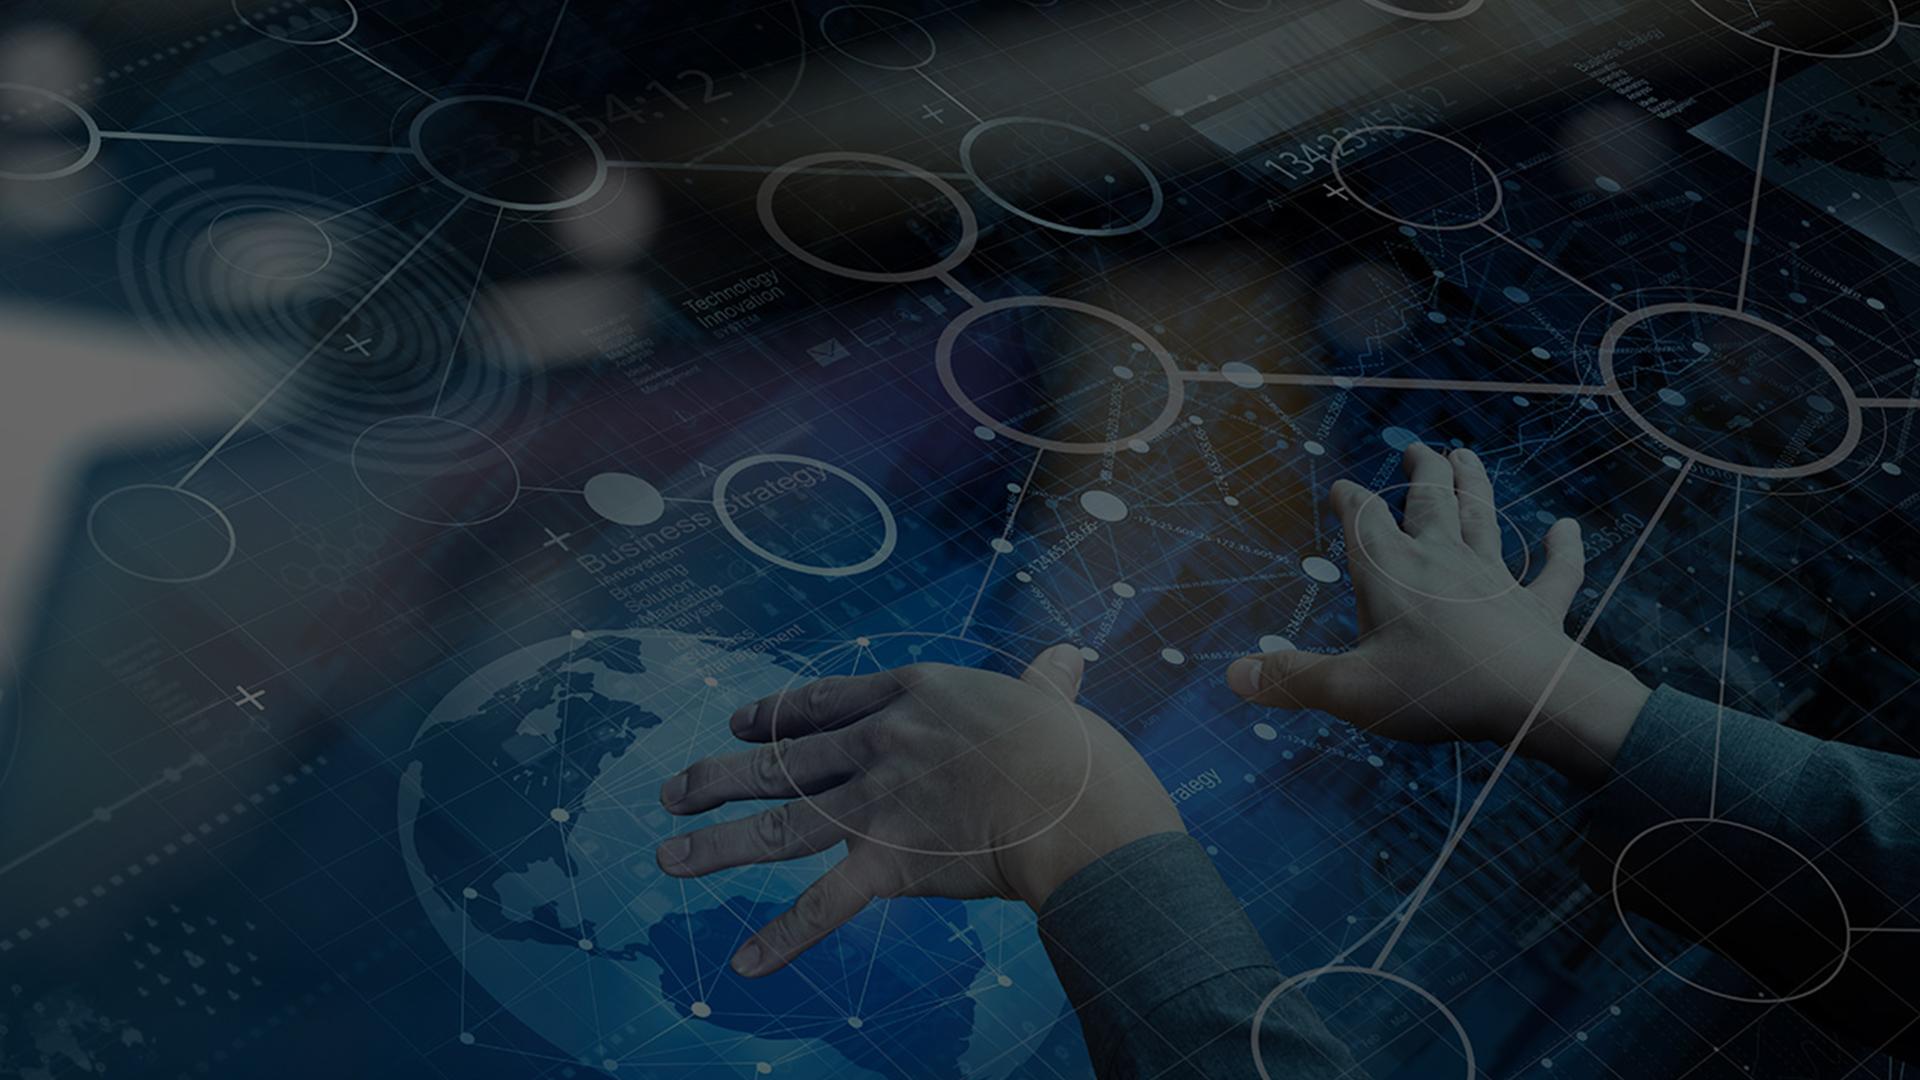 INFORMATION TECHNOLOGY & COMMUNICATION ¡¡CONVERGED!!